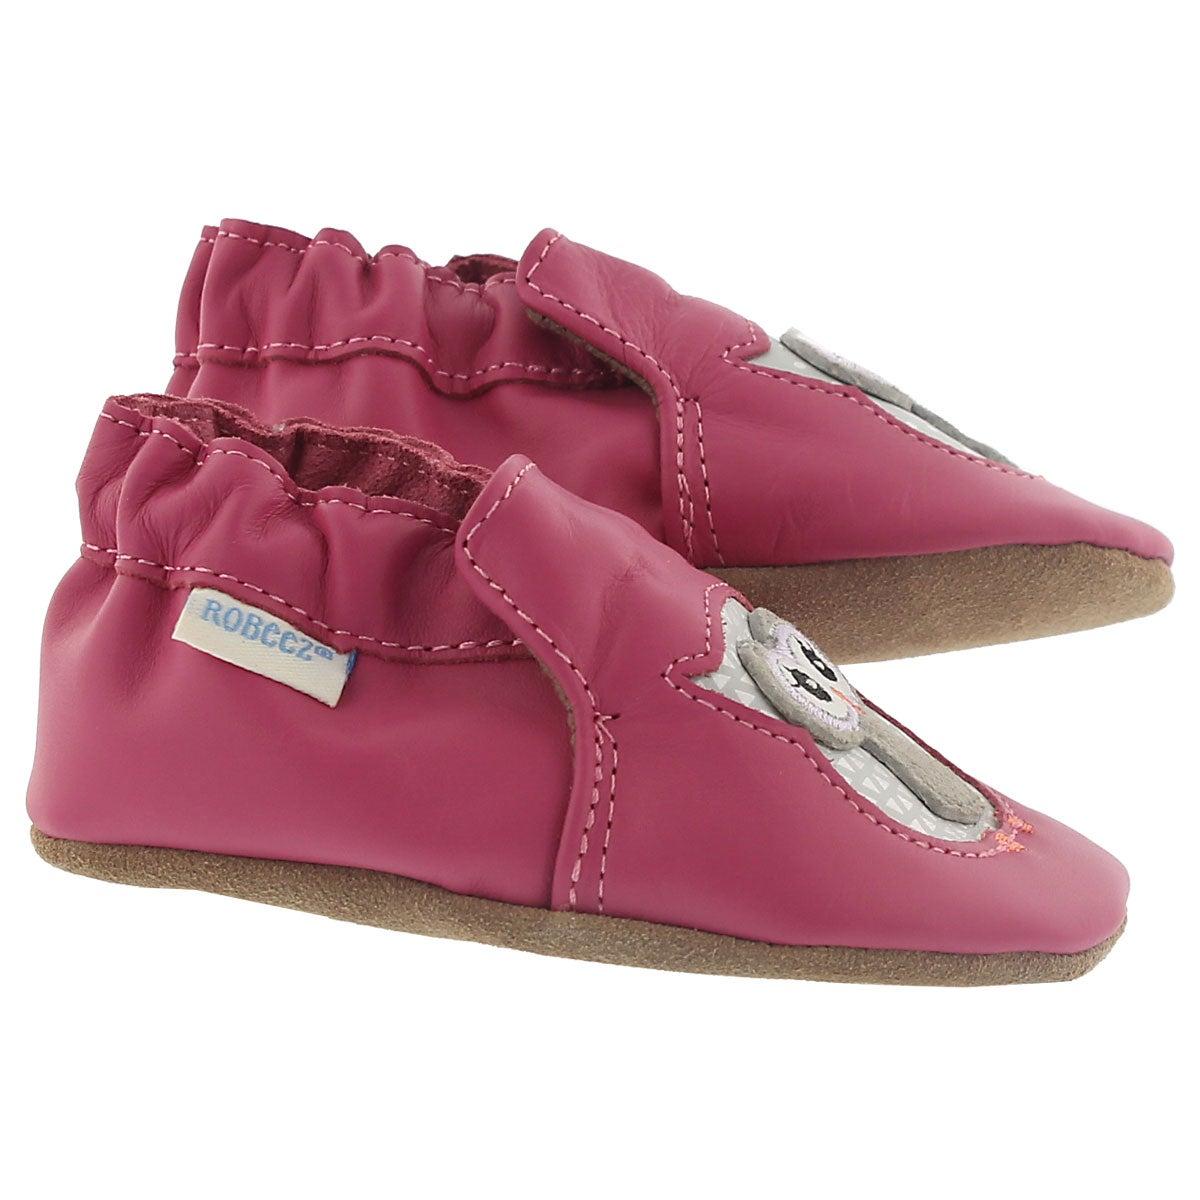 Infs-g Owl Playmates pink slipper